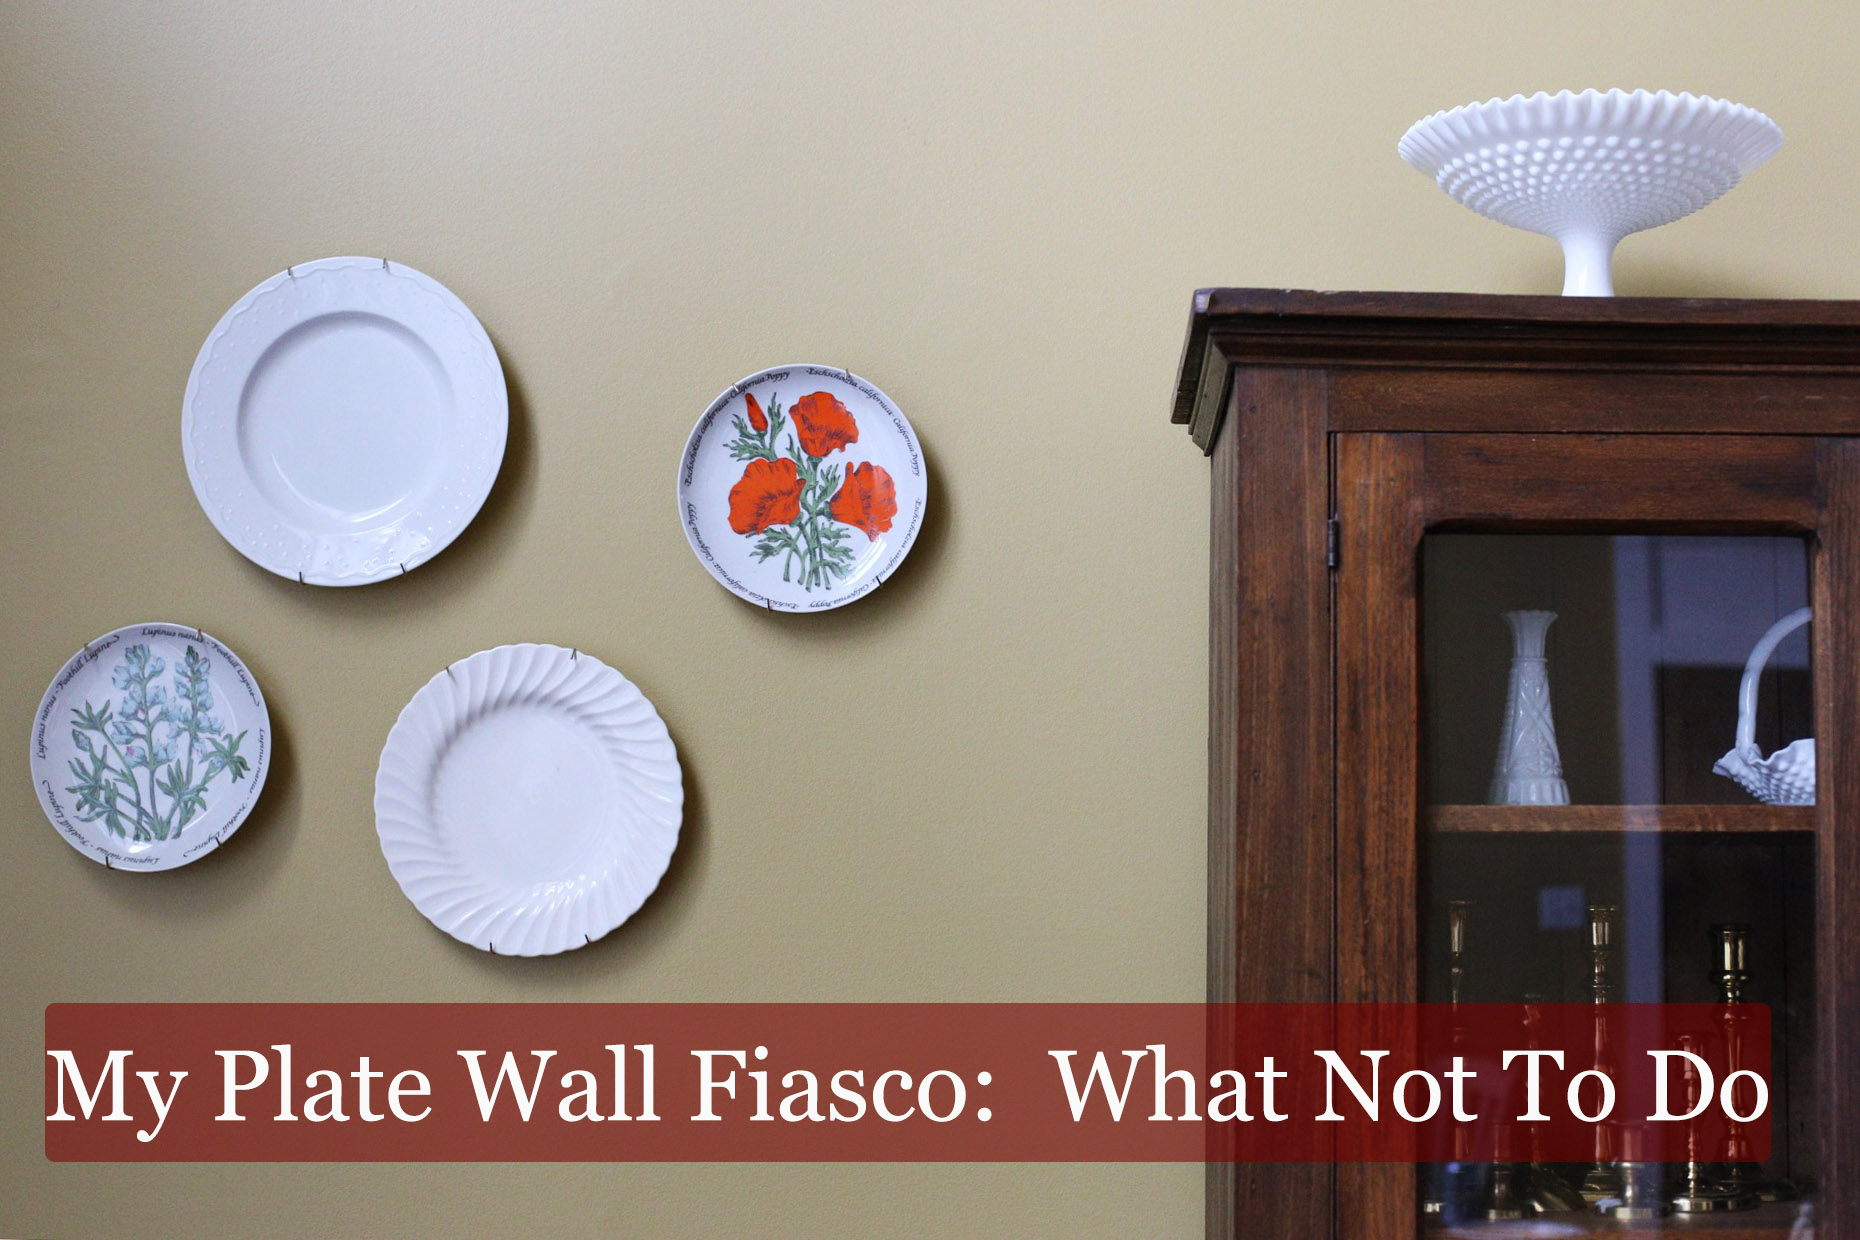 platewall1 copy.jpg